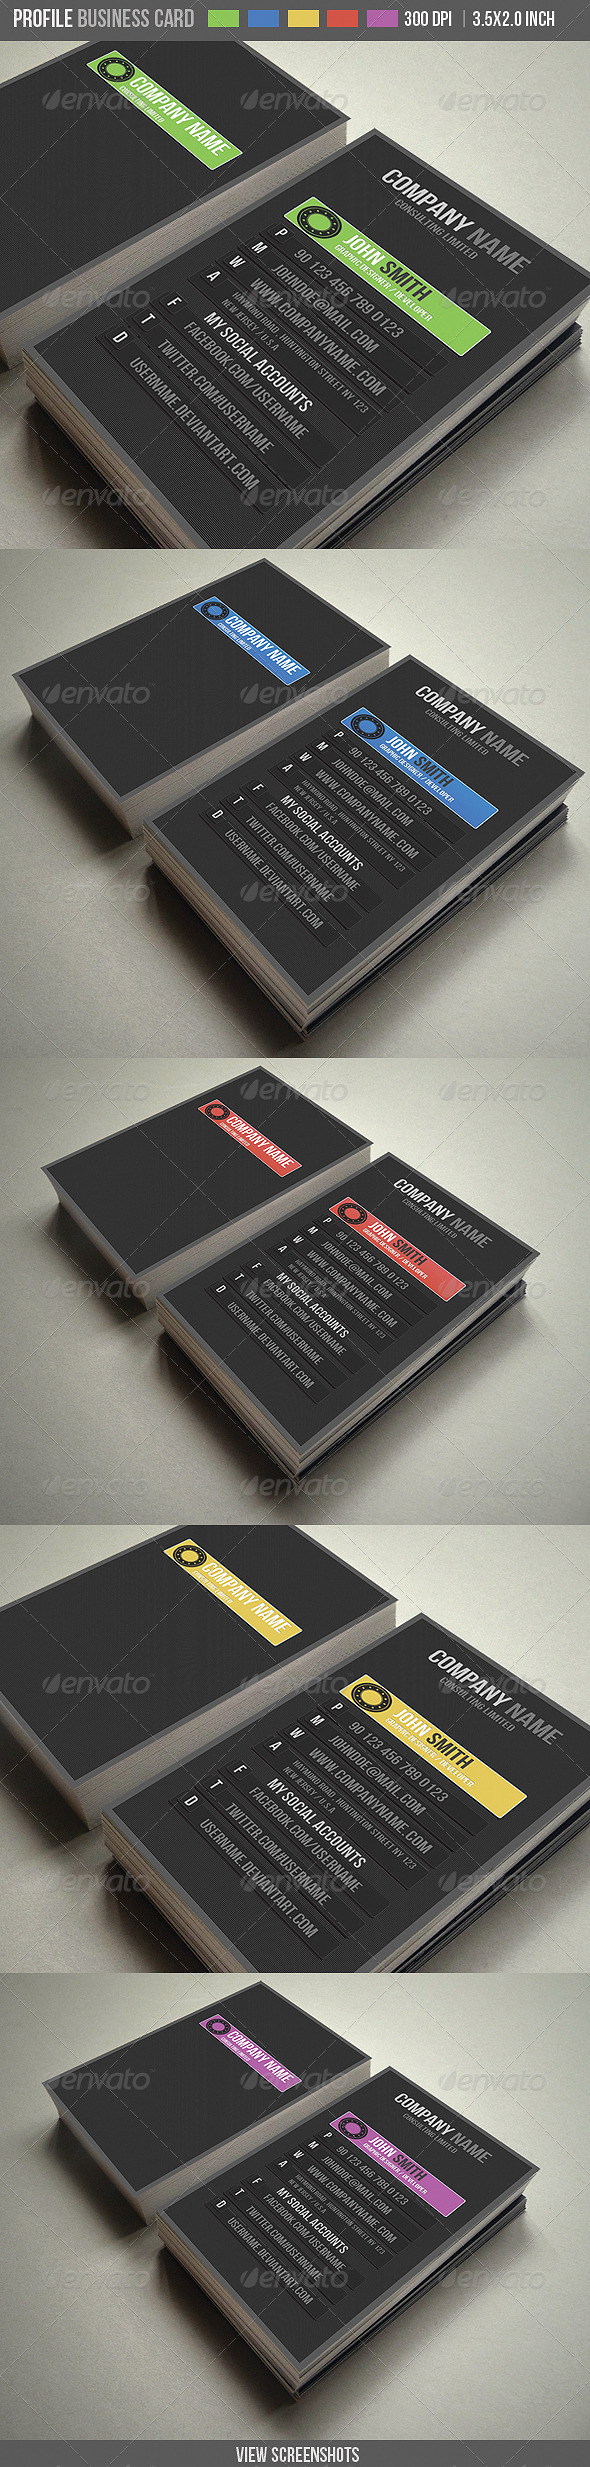 GraphicRiver PROFILE Business Card 5 Different Color 1686078